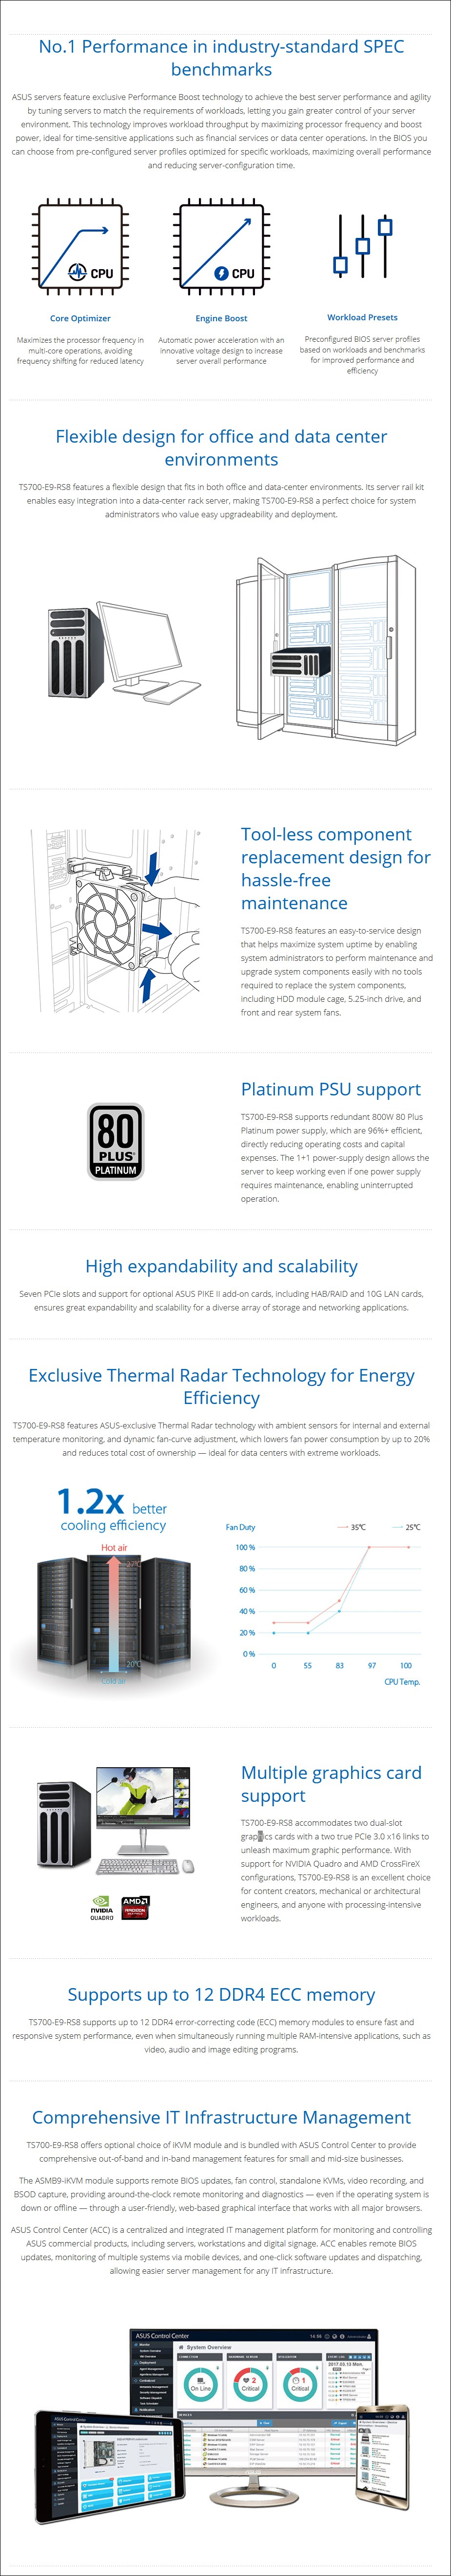 ASUS TS700-E9-RS8 Barebone Tower Server CPU(0/2) RAM(0/12) HDD(0/8) 800W PSU - Overview 1